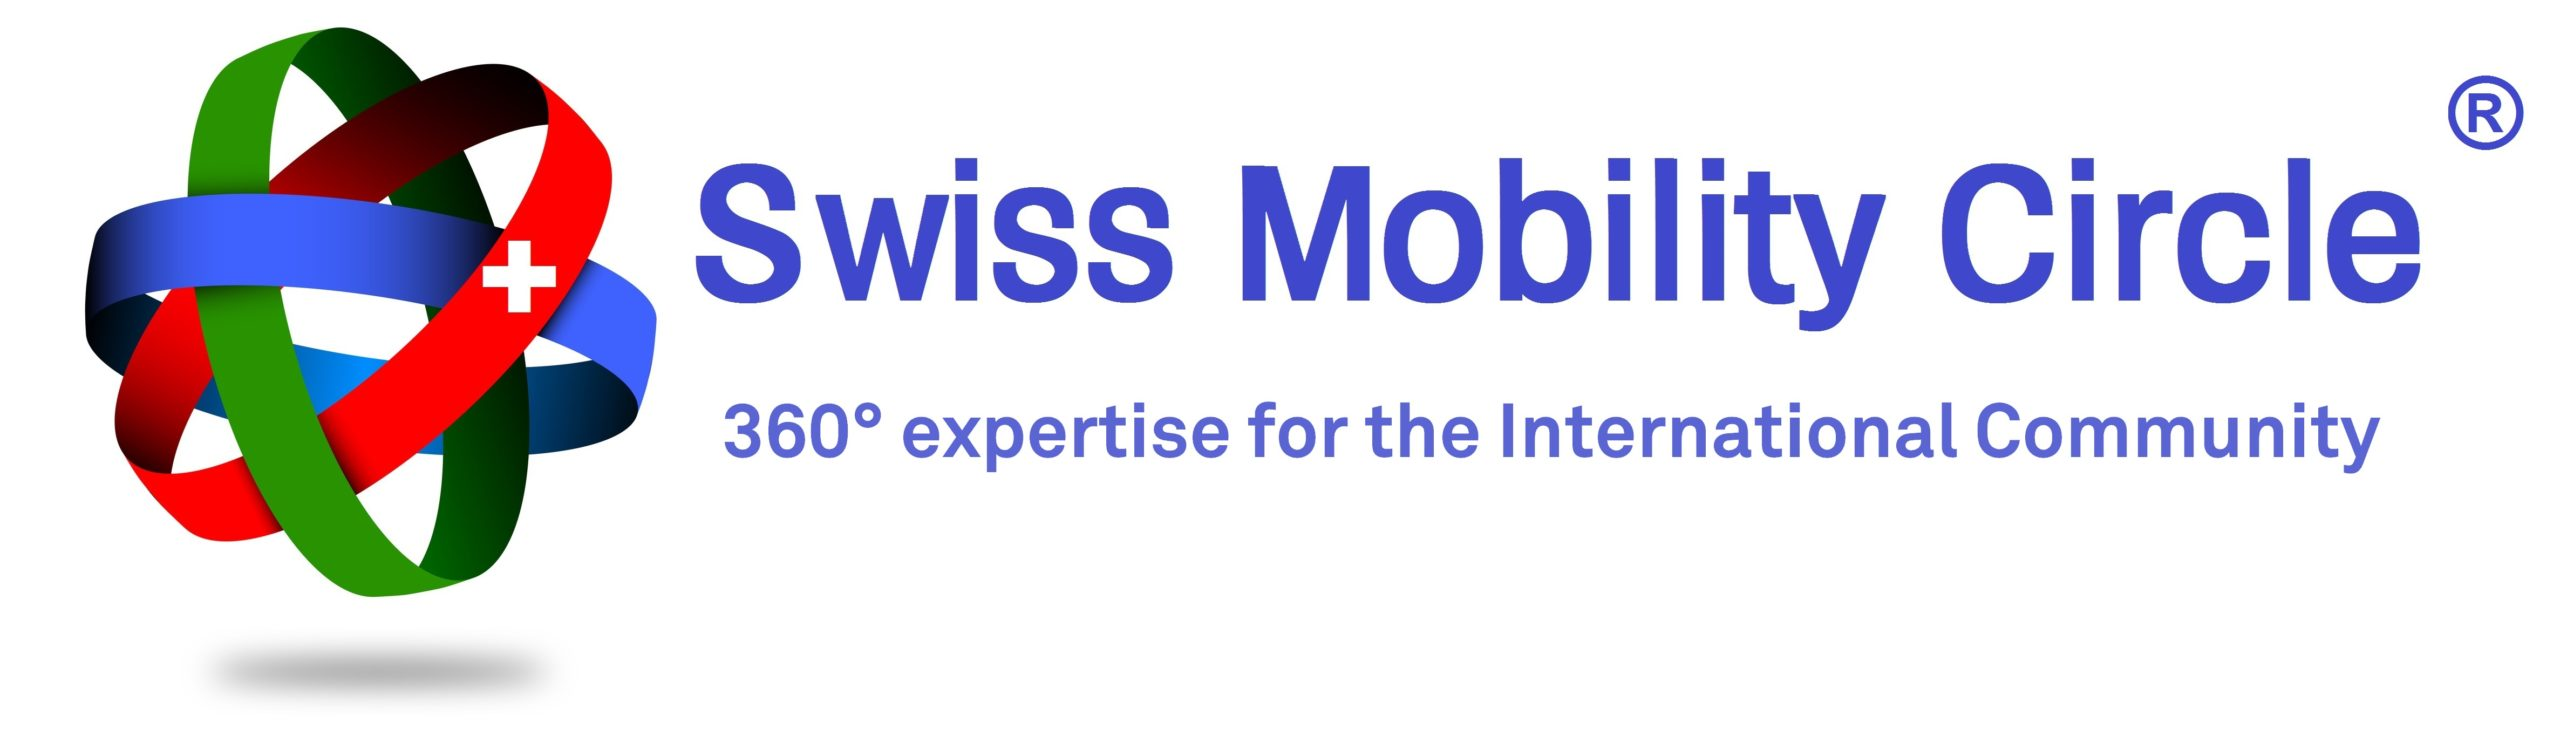 SWISS MOBILITY CIRCLE